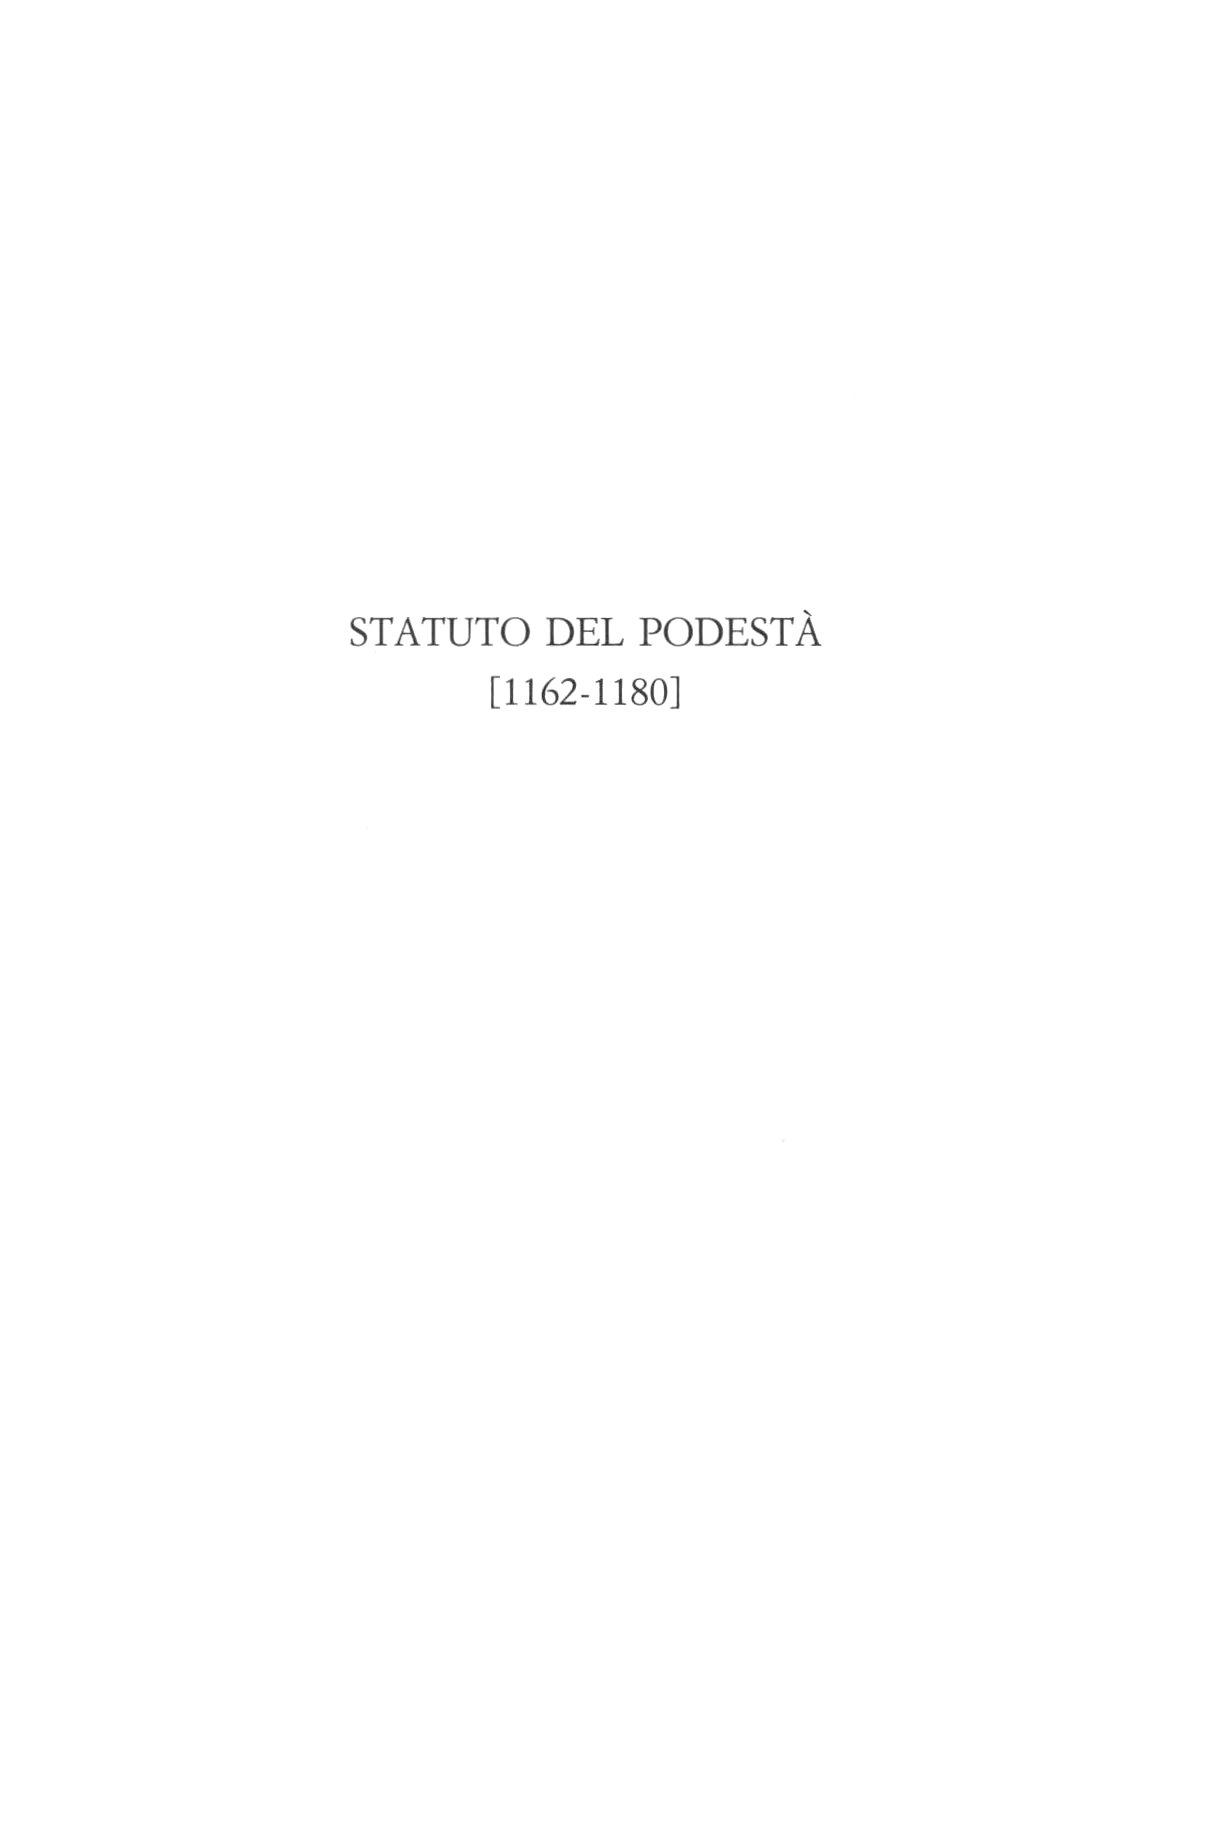 statuti pistoiesi del sec.XII 0229.jpg